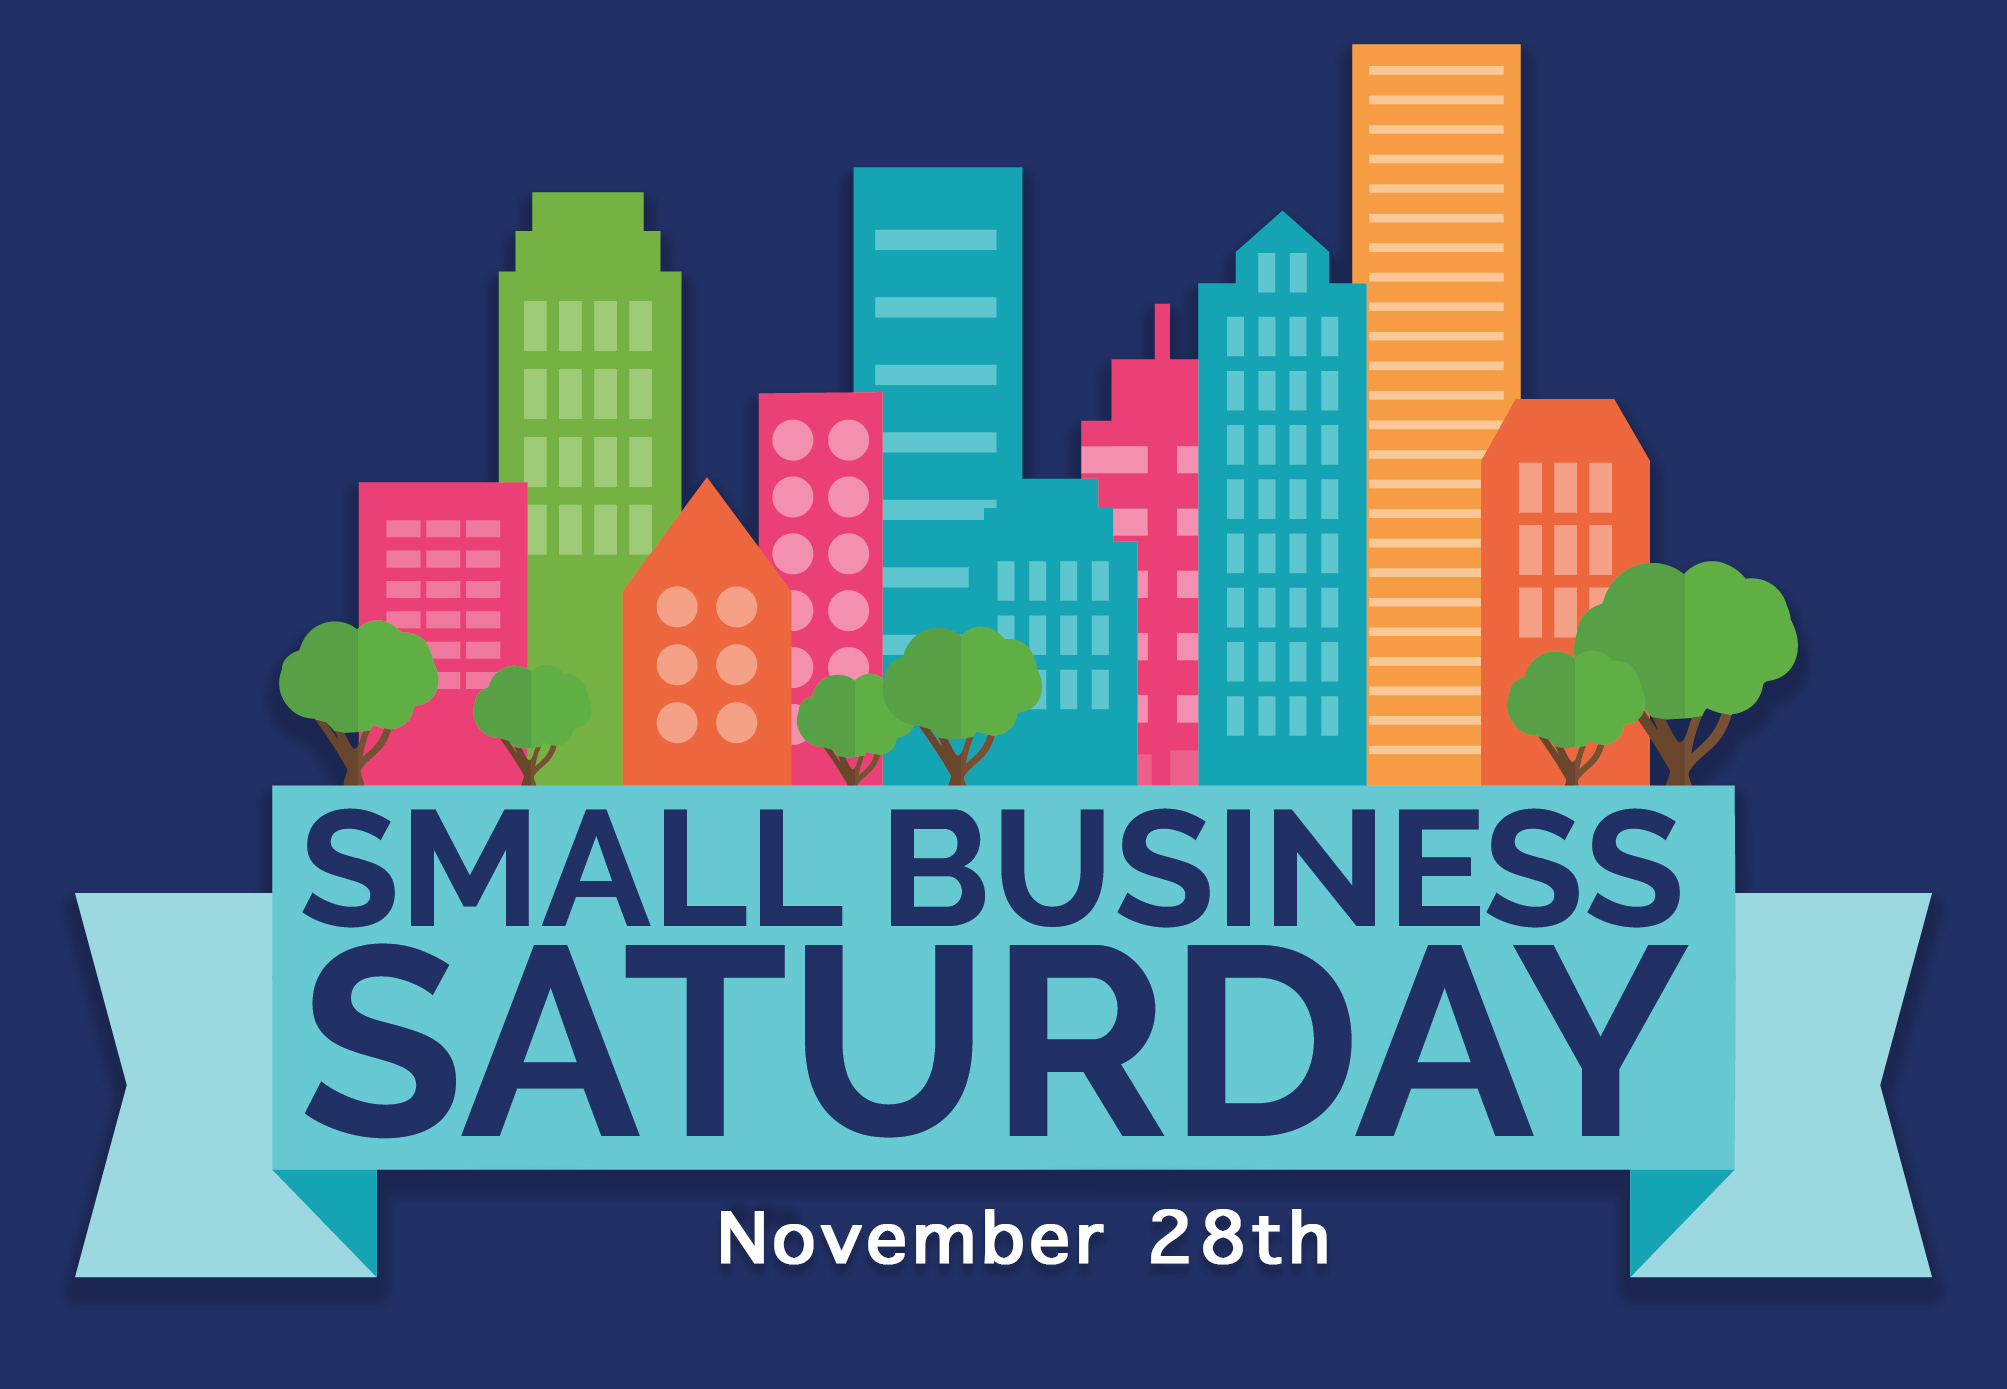 Small_Business_Saturday03.jpg